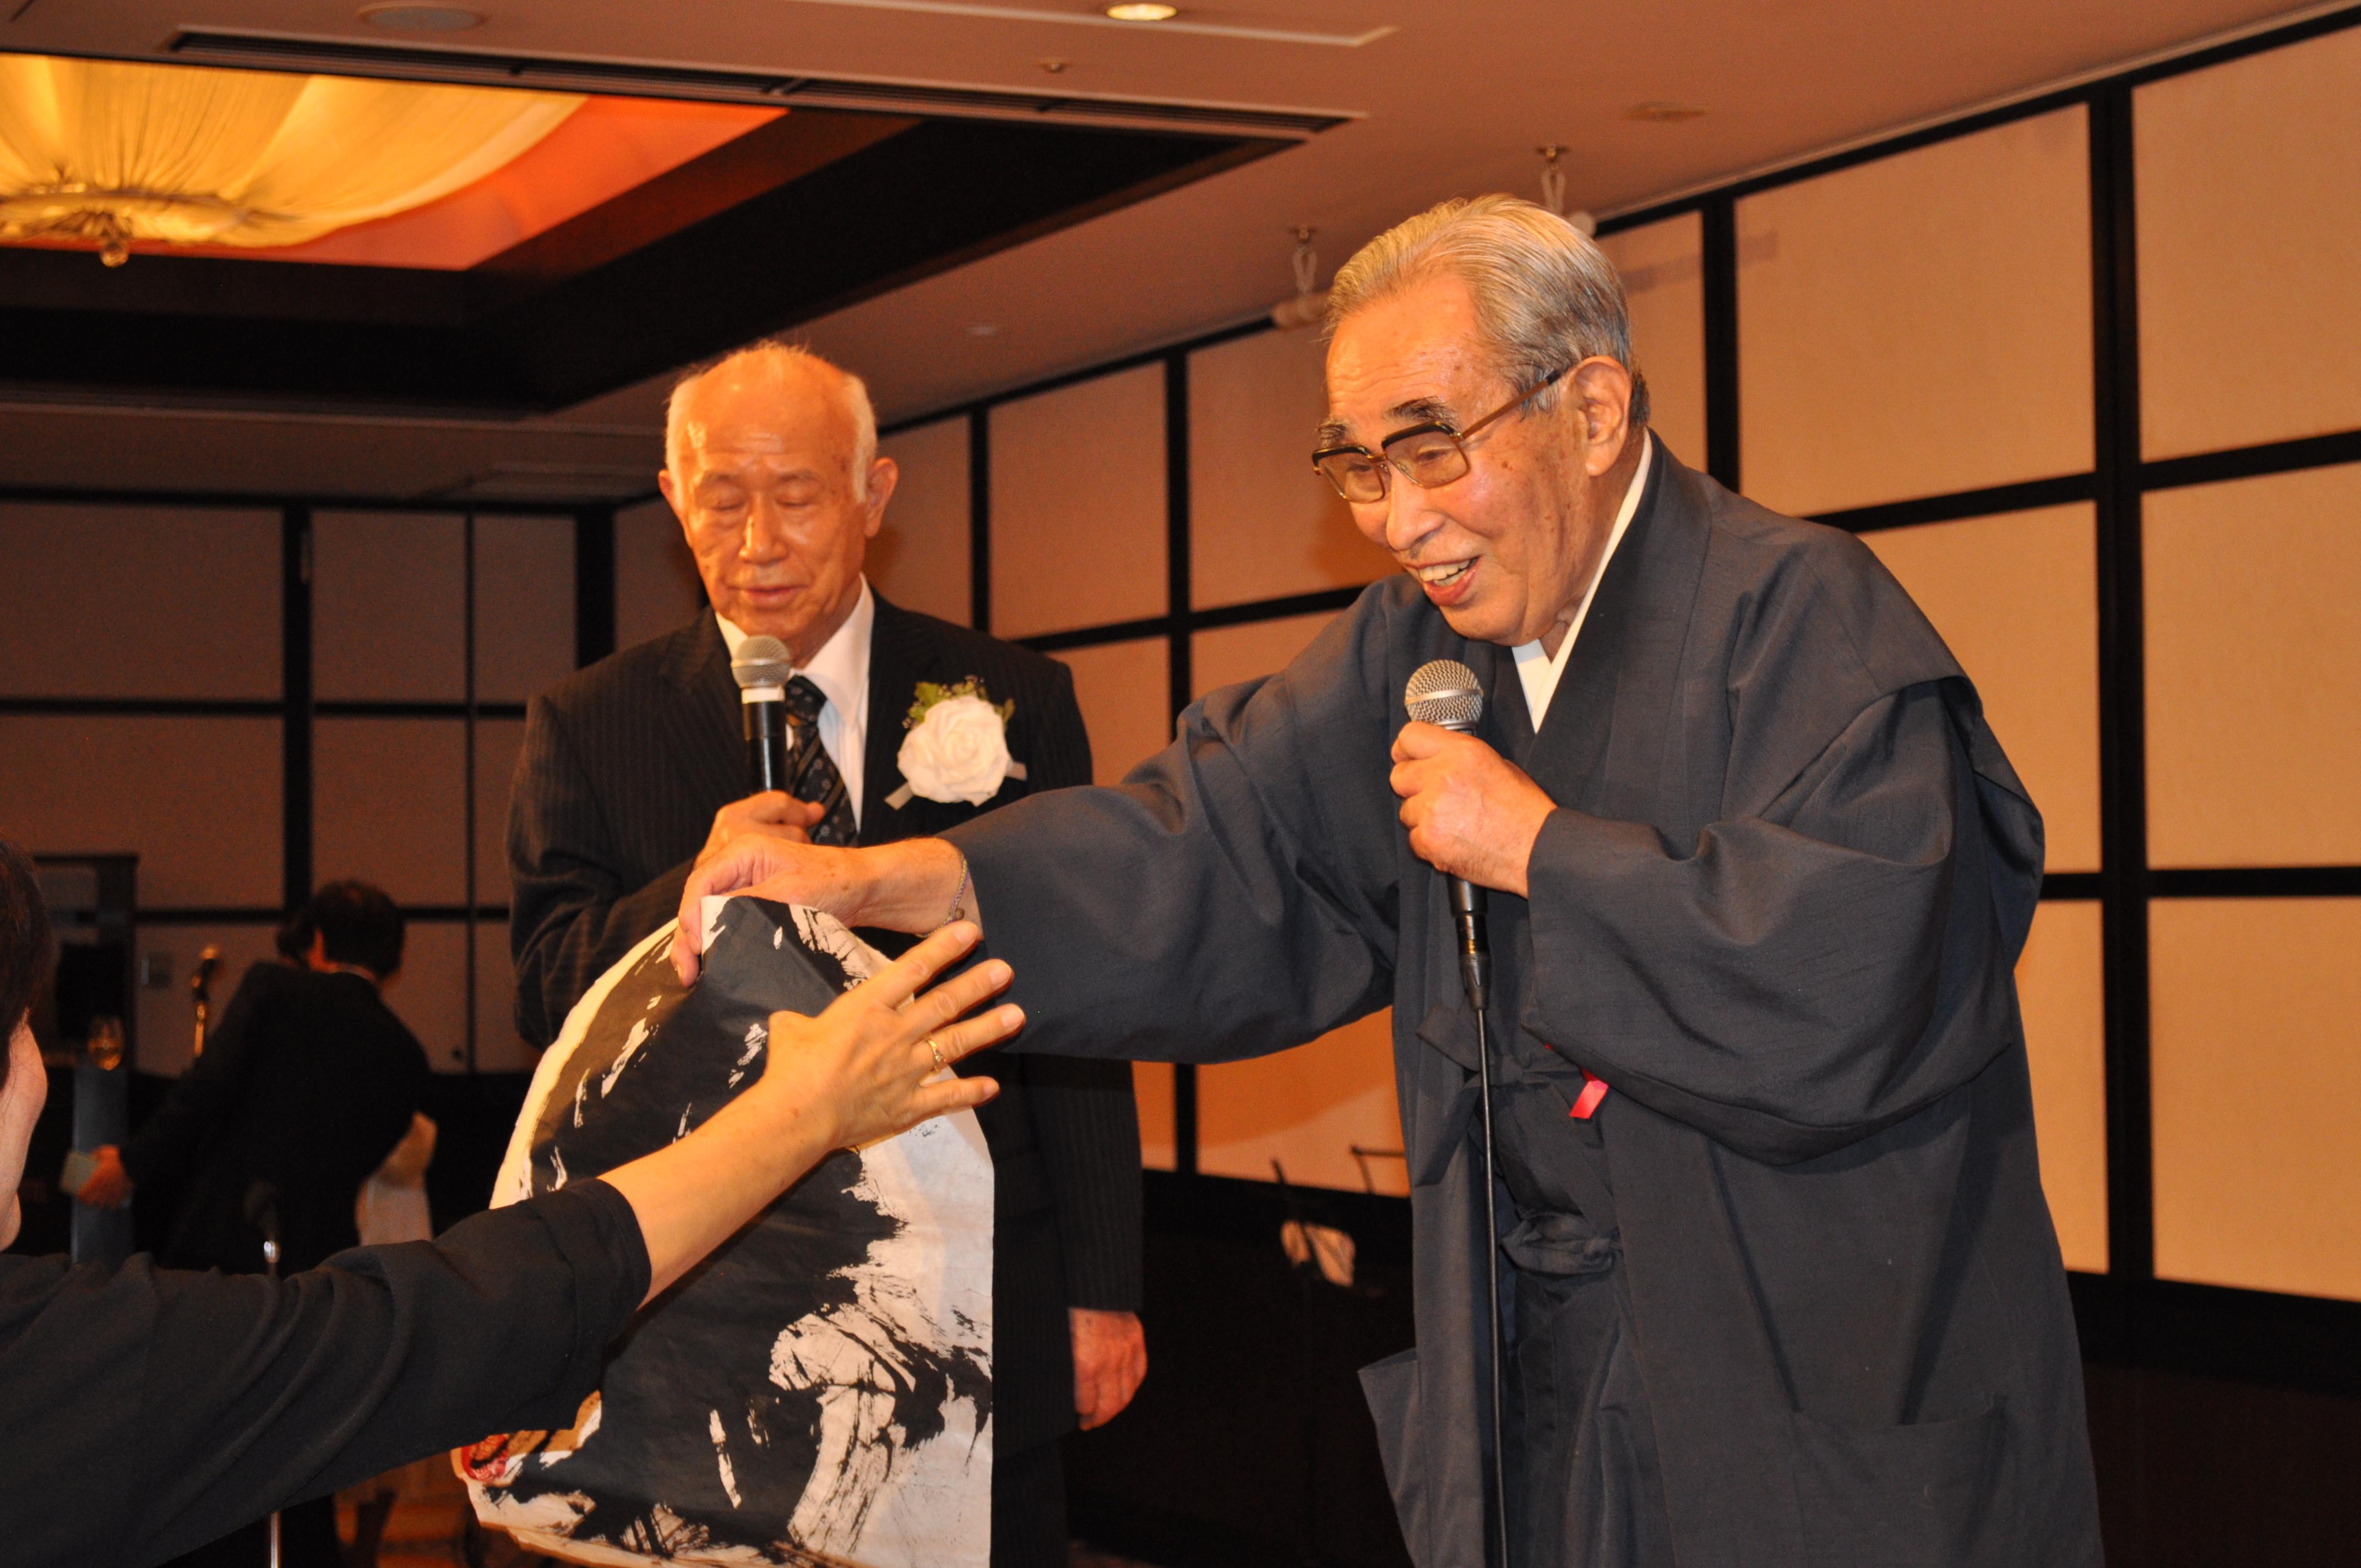 DSC 0557 - 第6回思風会全国大会2018in東京開催